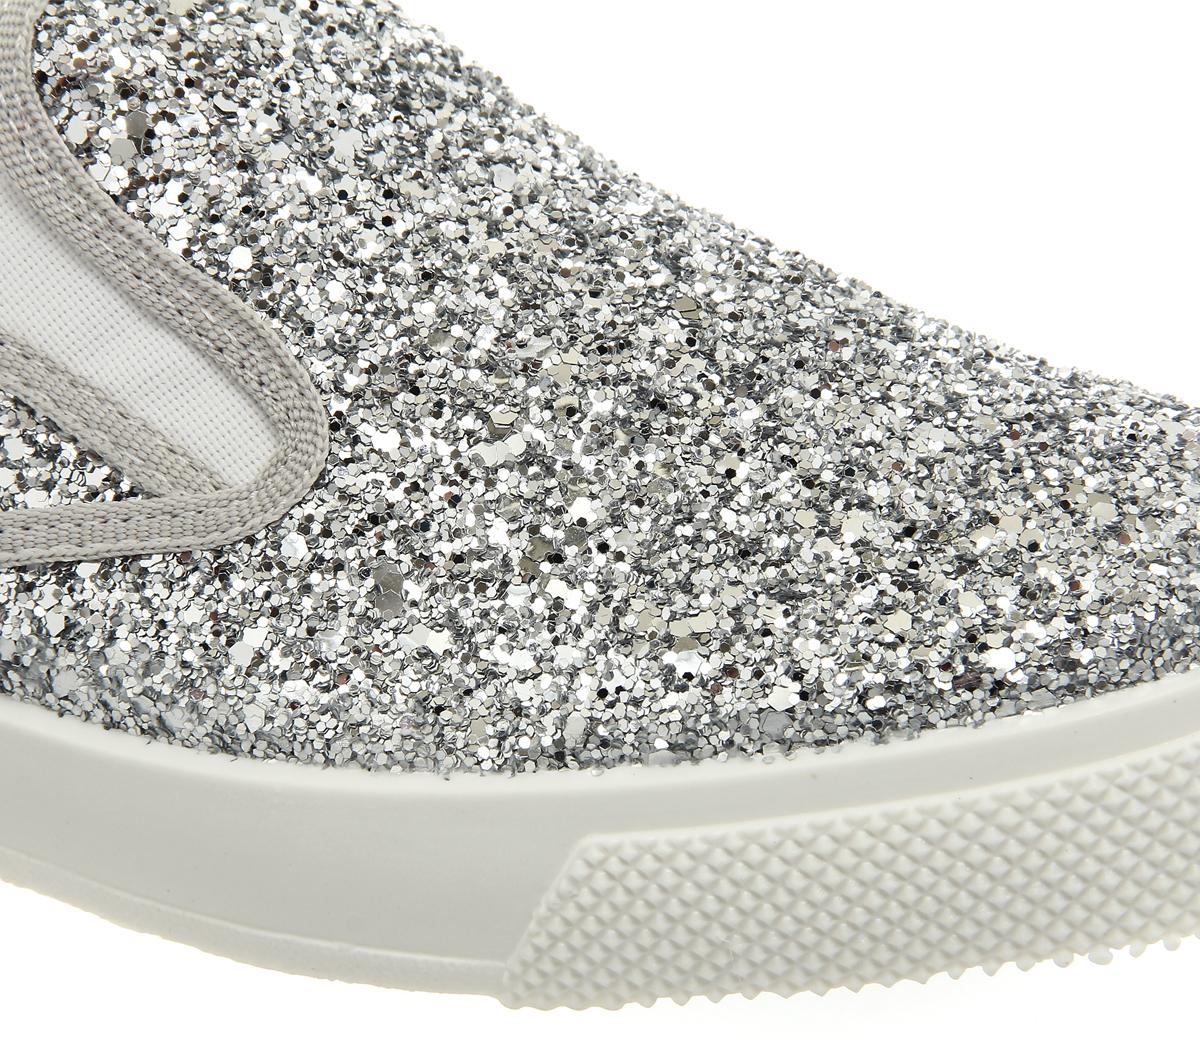 3da04a235514 Womens Office Kicker Slip On Shoes Silver Glitter Flats